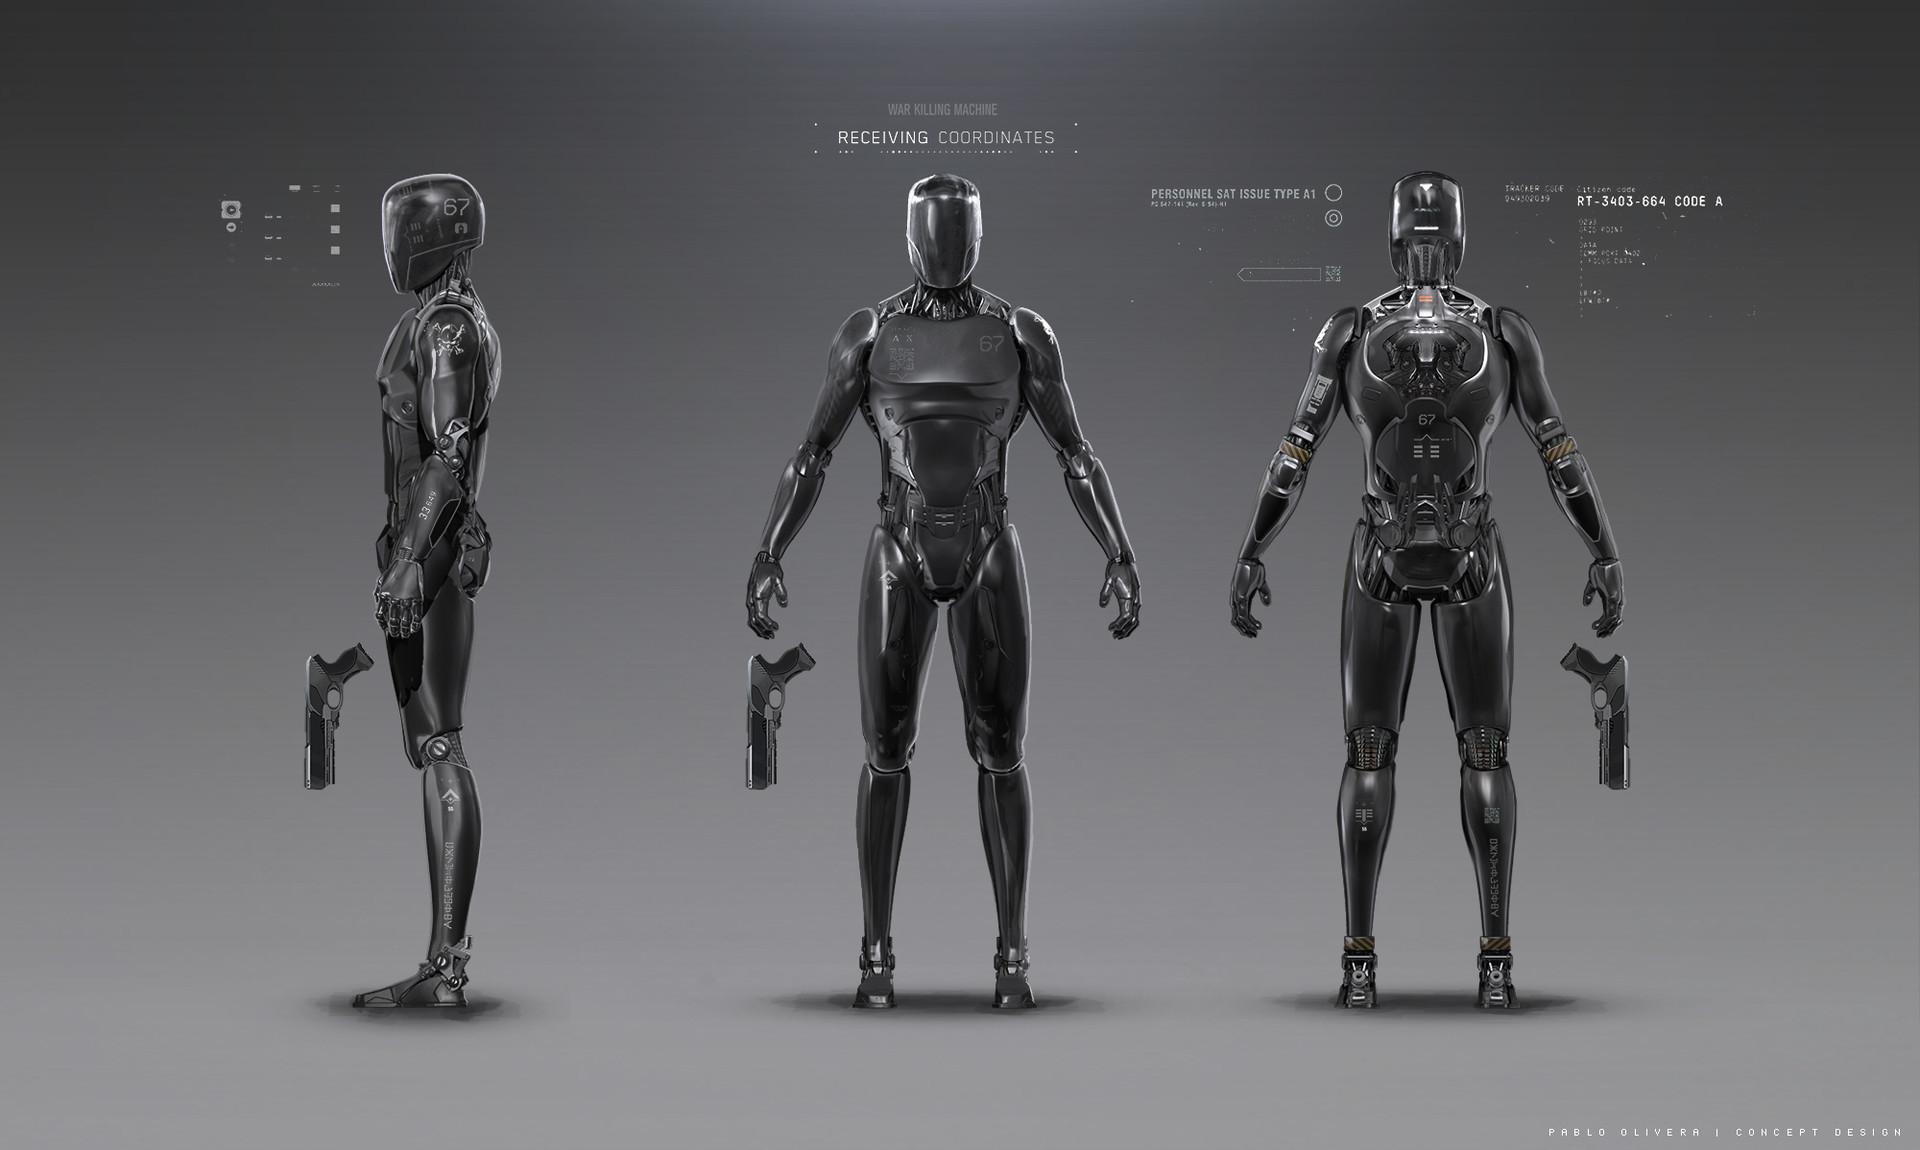 Pablo olivera pablo olivera concep art uncally robot v30 v4 presentacion3